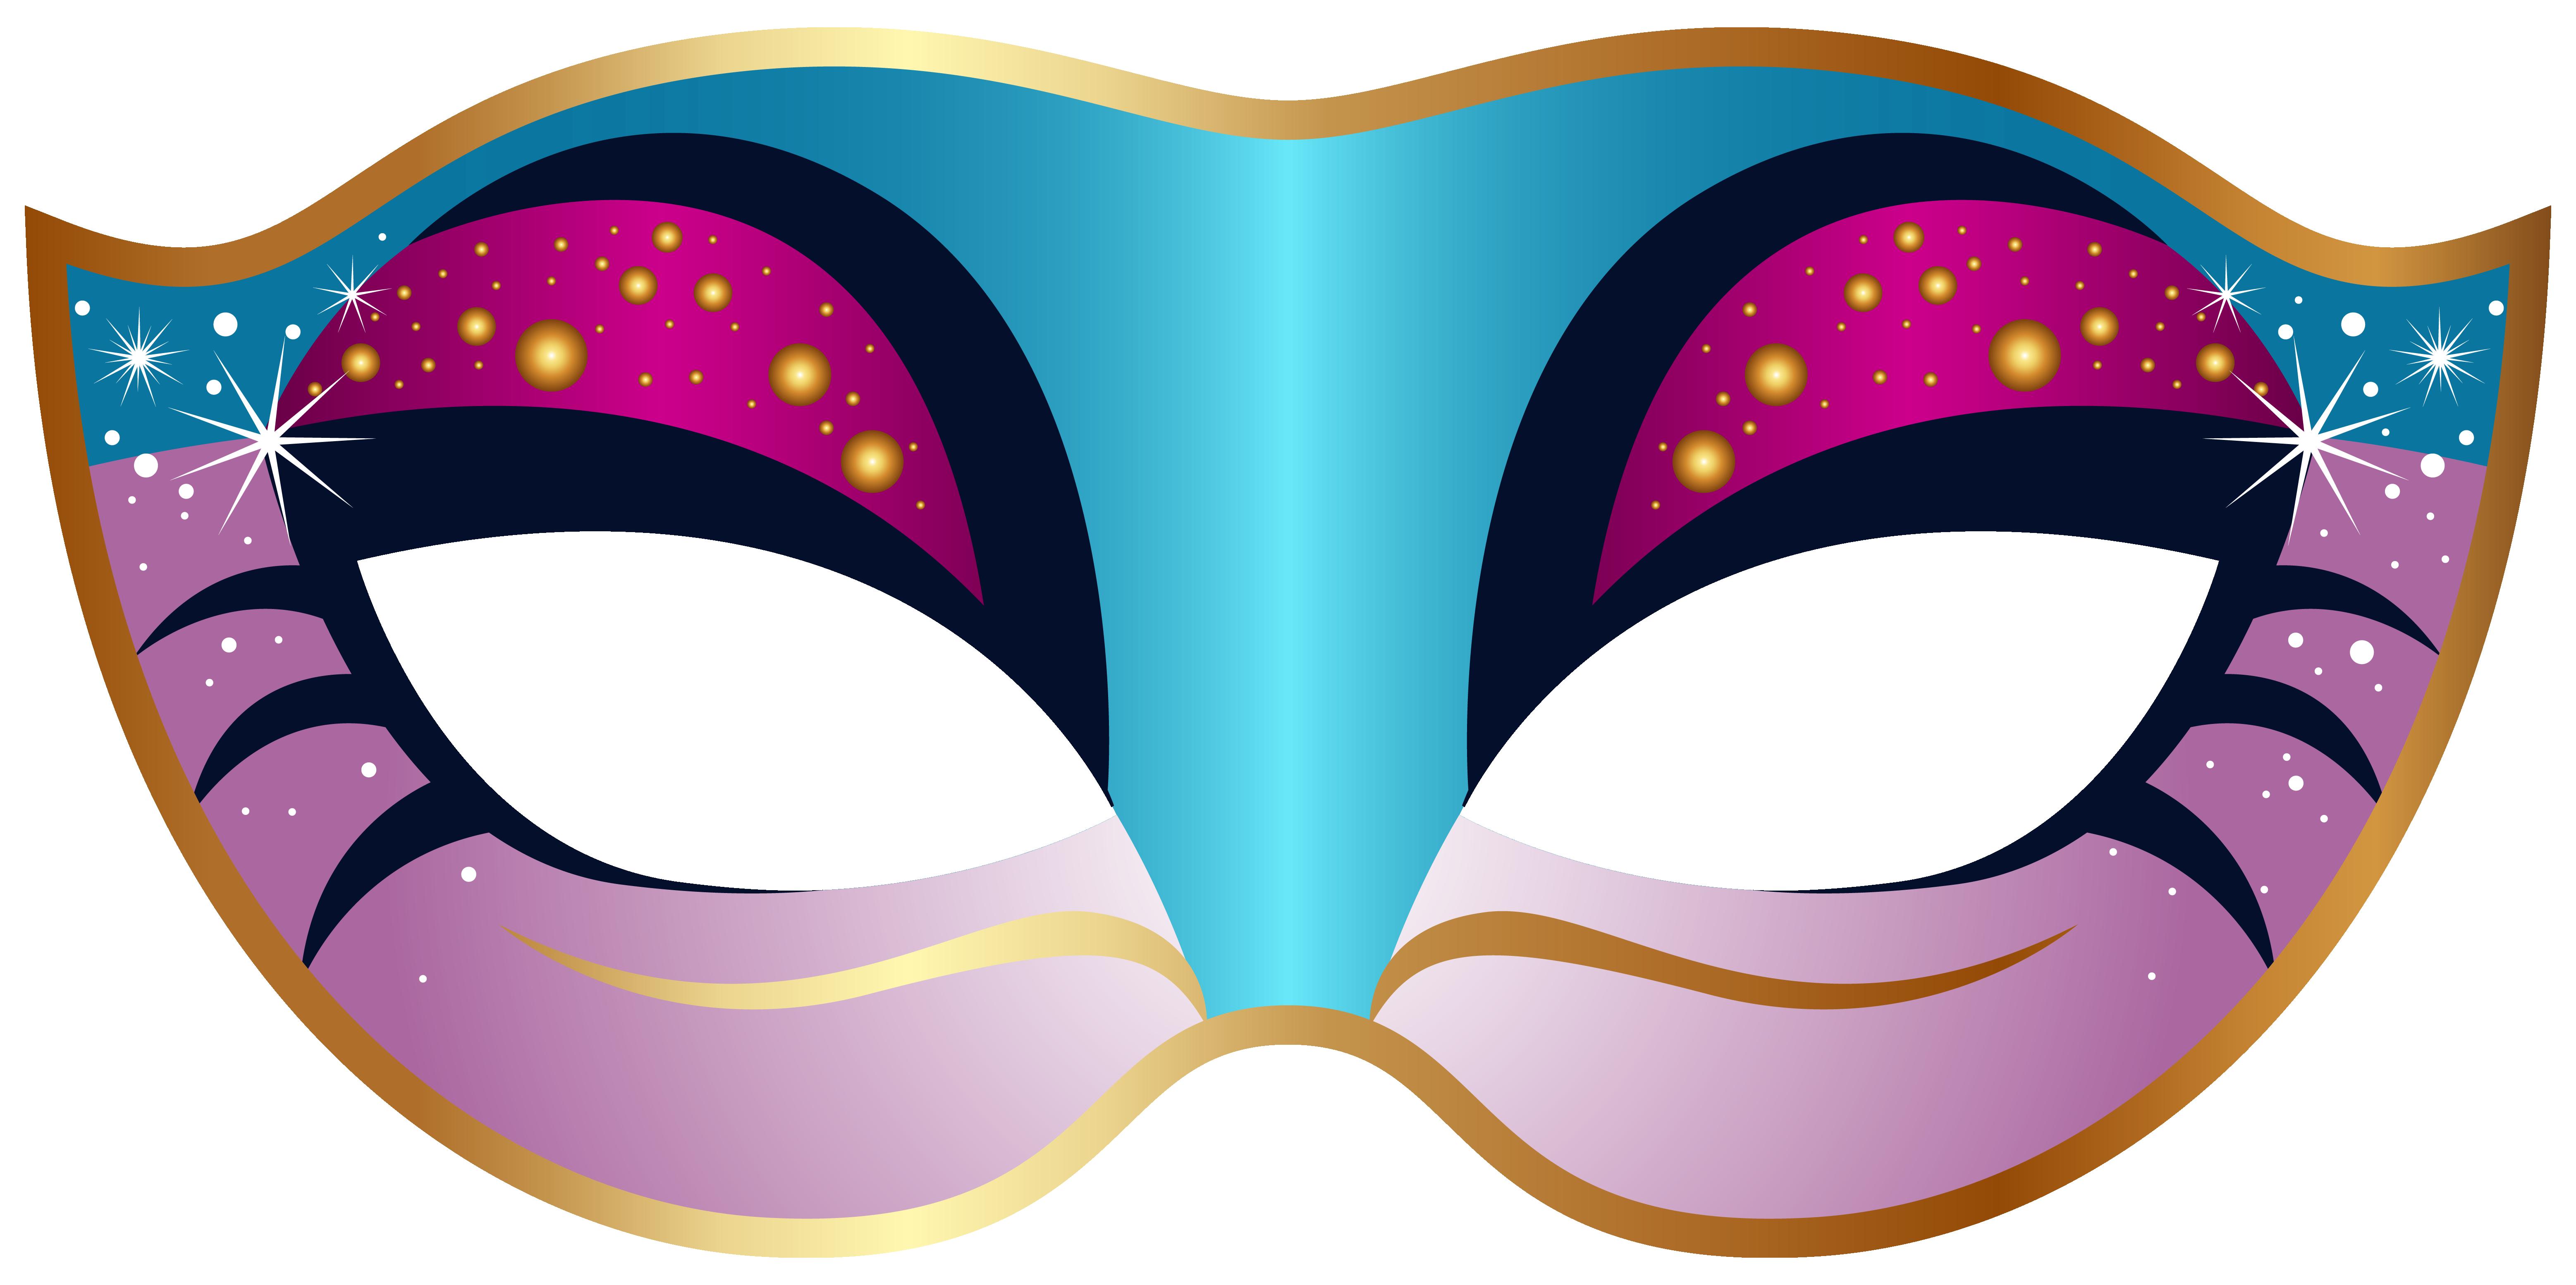 Carneval clipart carnival mask Blue clip clip art image